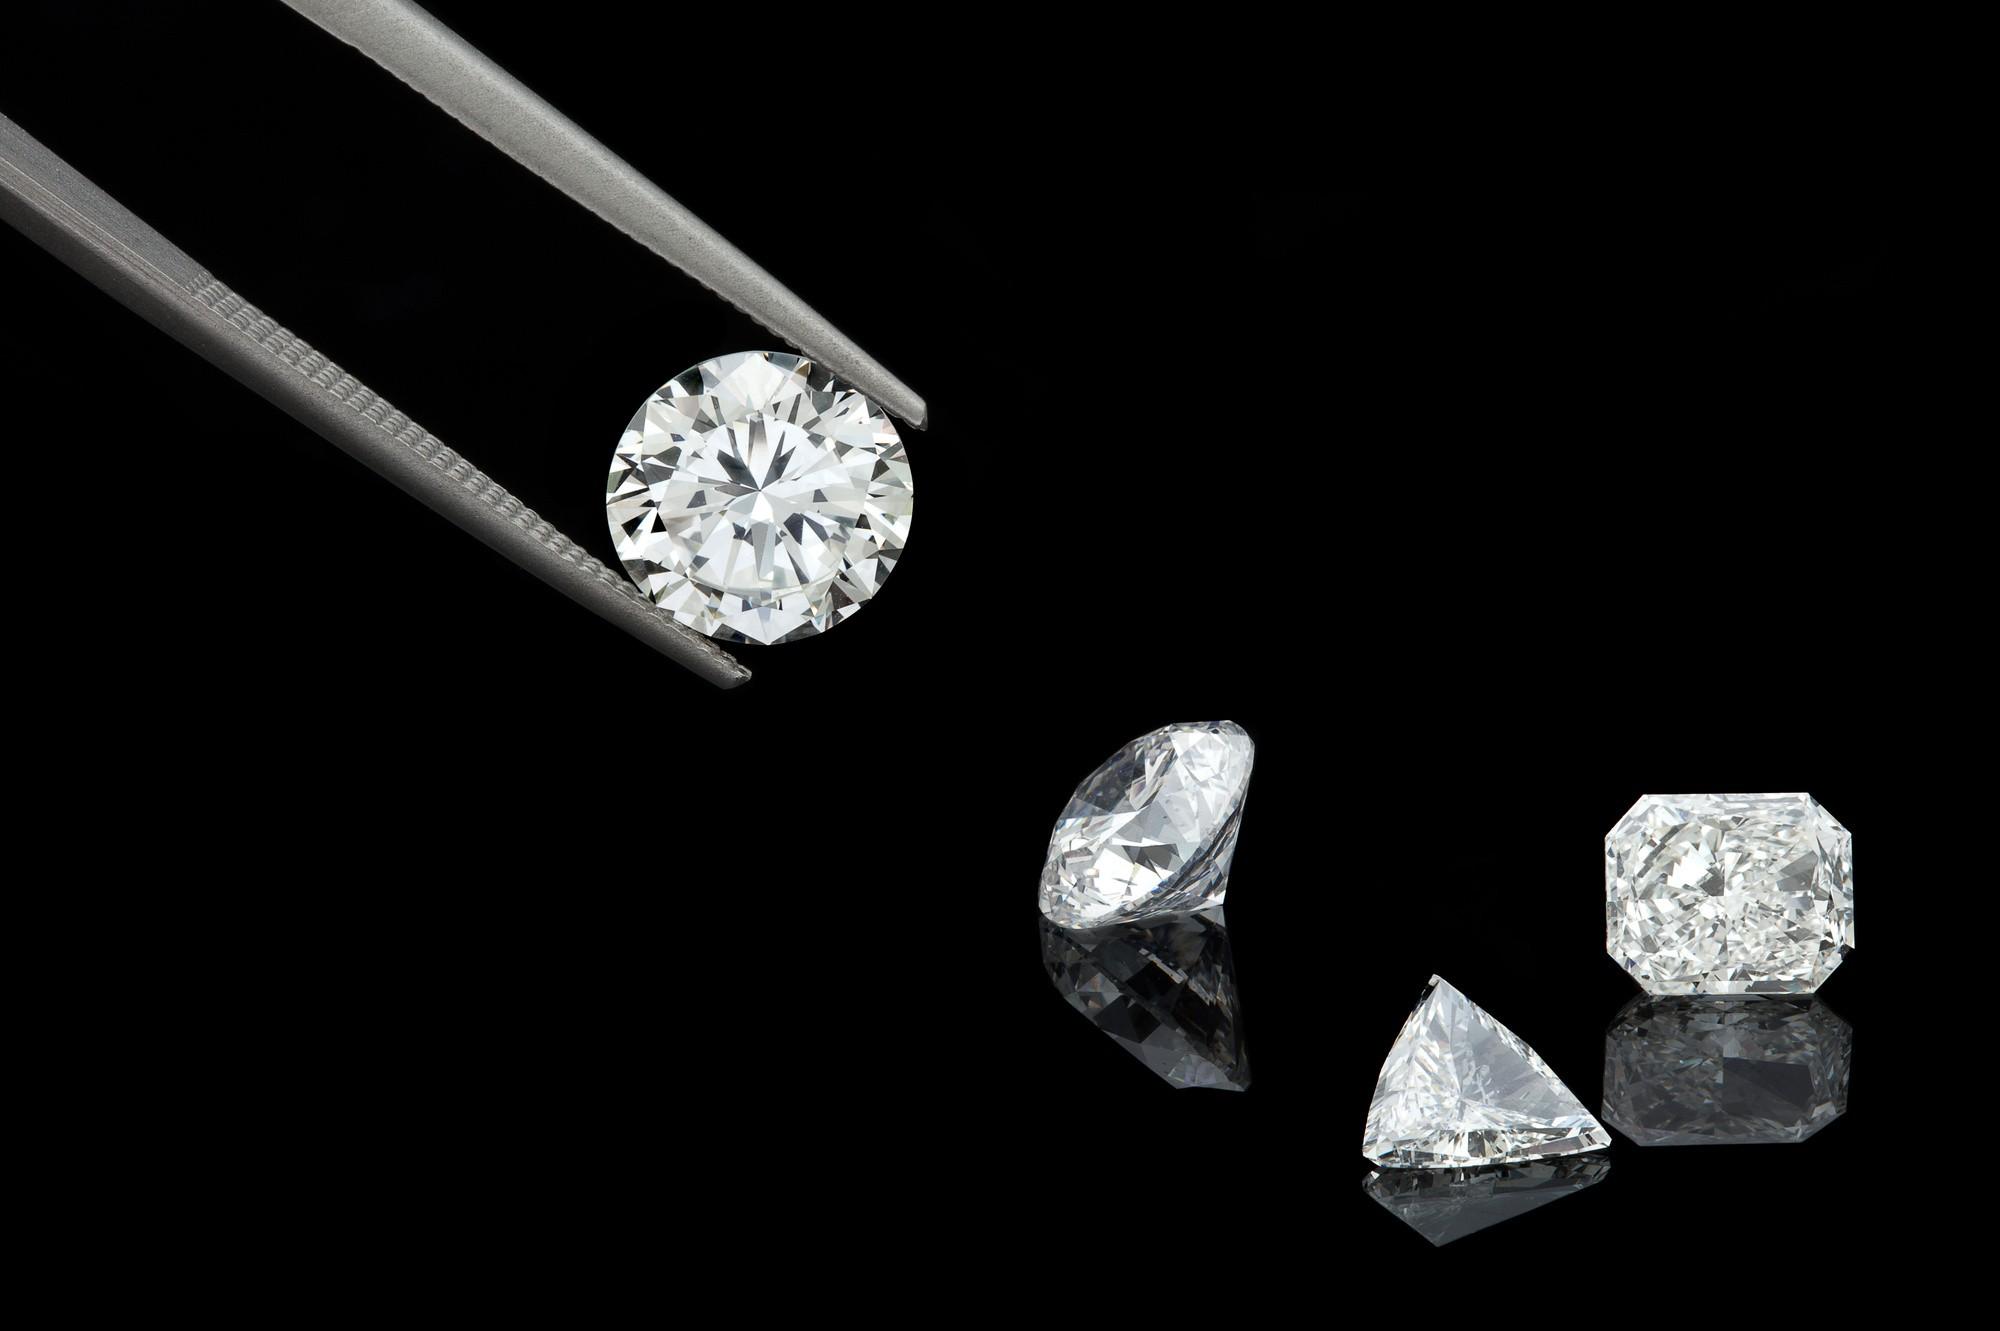 Moissanite vs Diamonds: Why You Should Choose Moissanite Over Diamonds